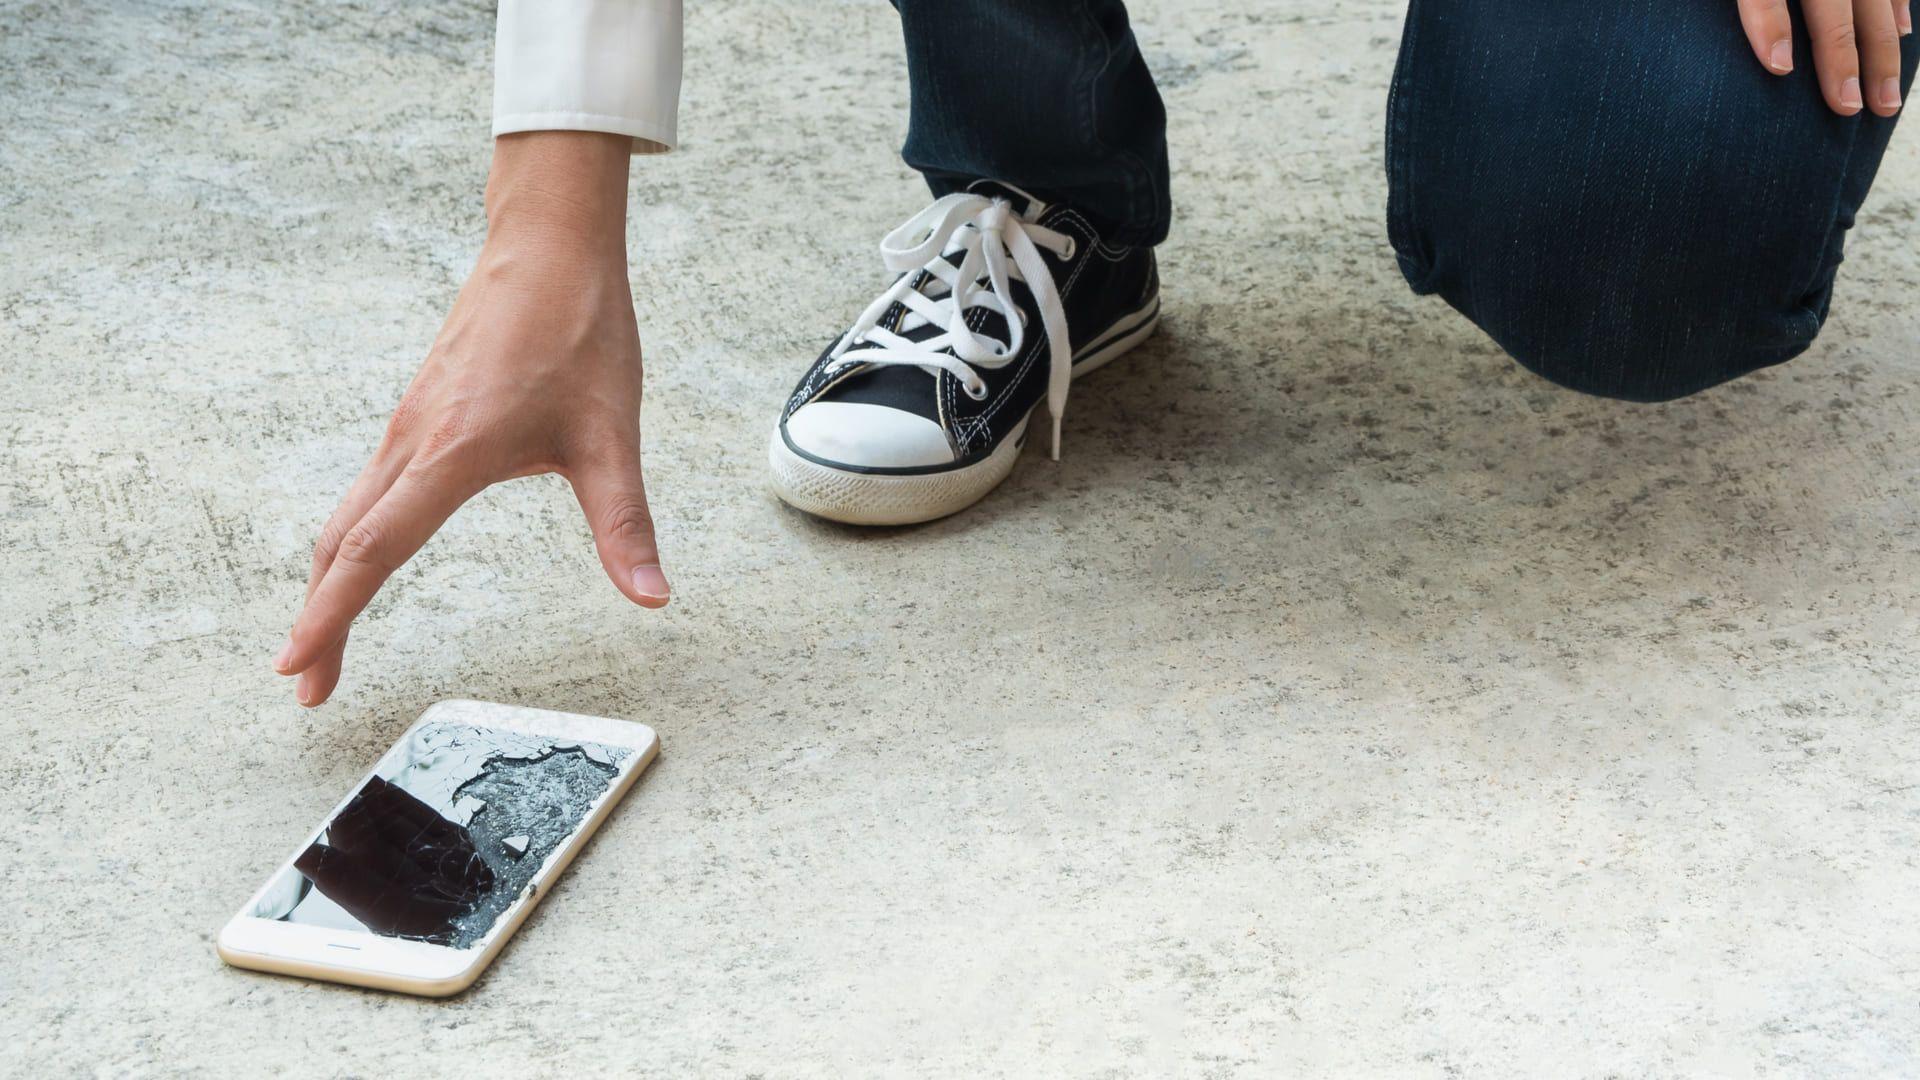 Compare preços de celular no Zoom (Poravute Siriphiroon/Shutterstock)